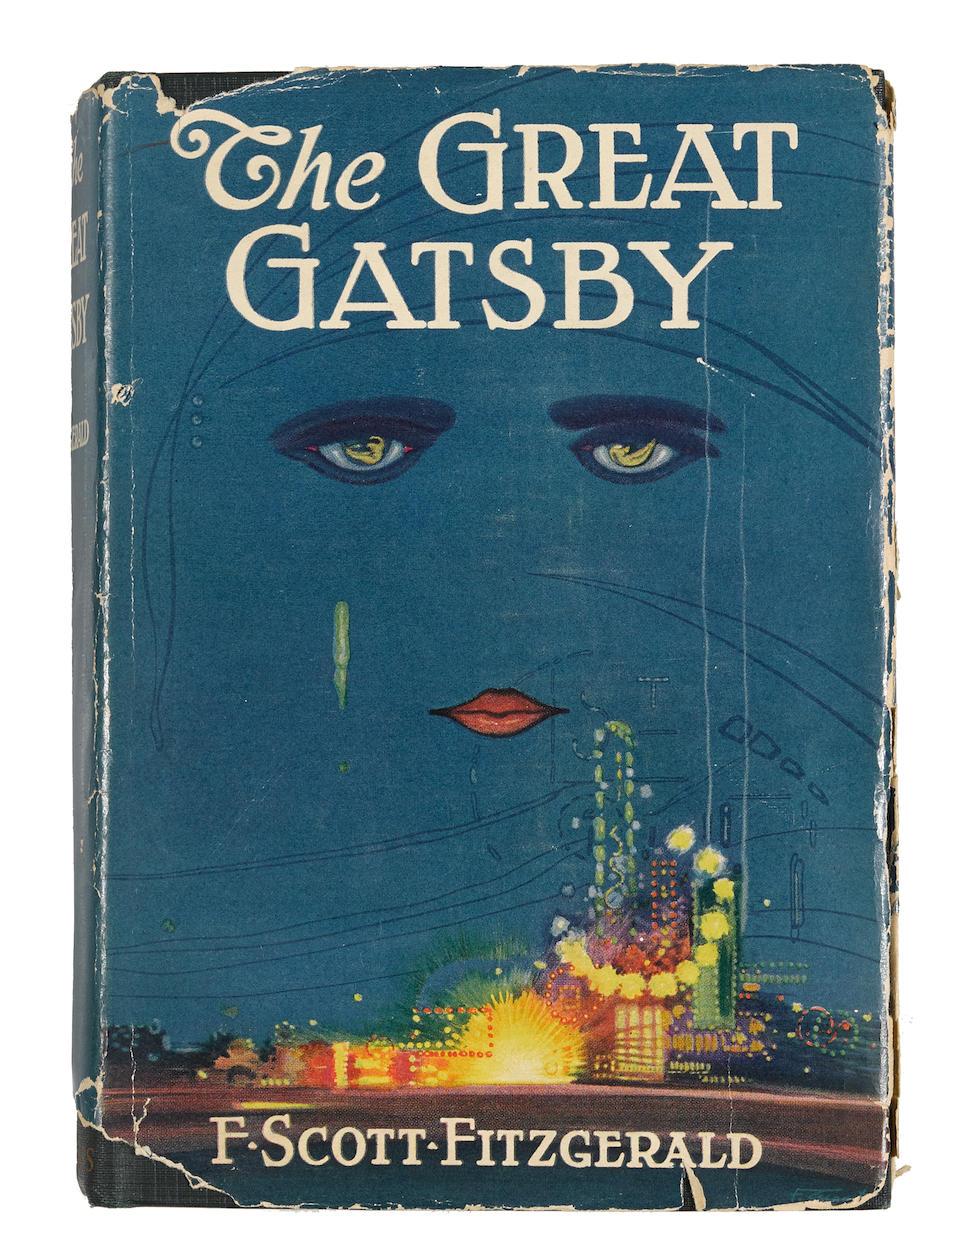 FITZGERALD, F. SCOTT. 1896-1940.   The Great Gatsby. New York: Charles Scribner's Sons, 1925.